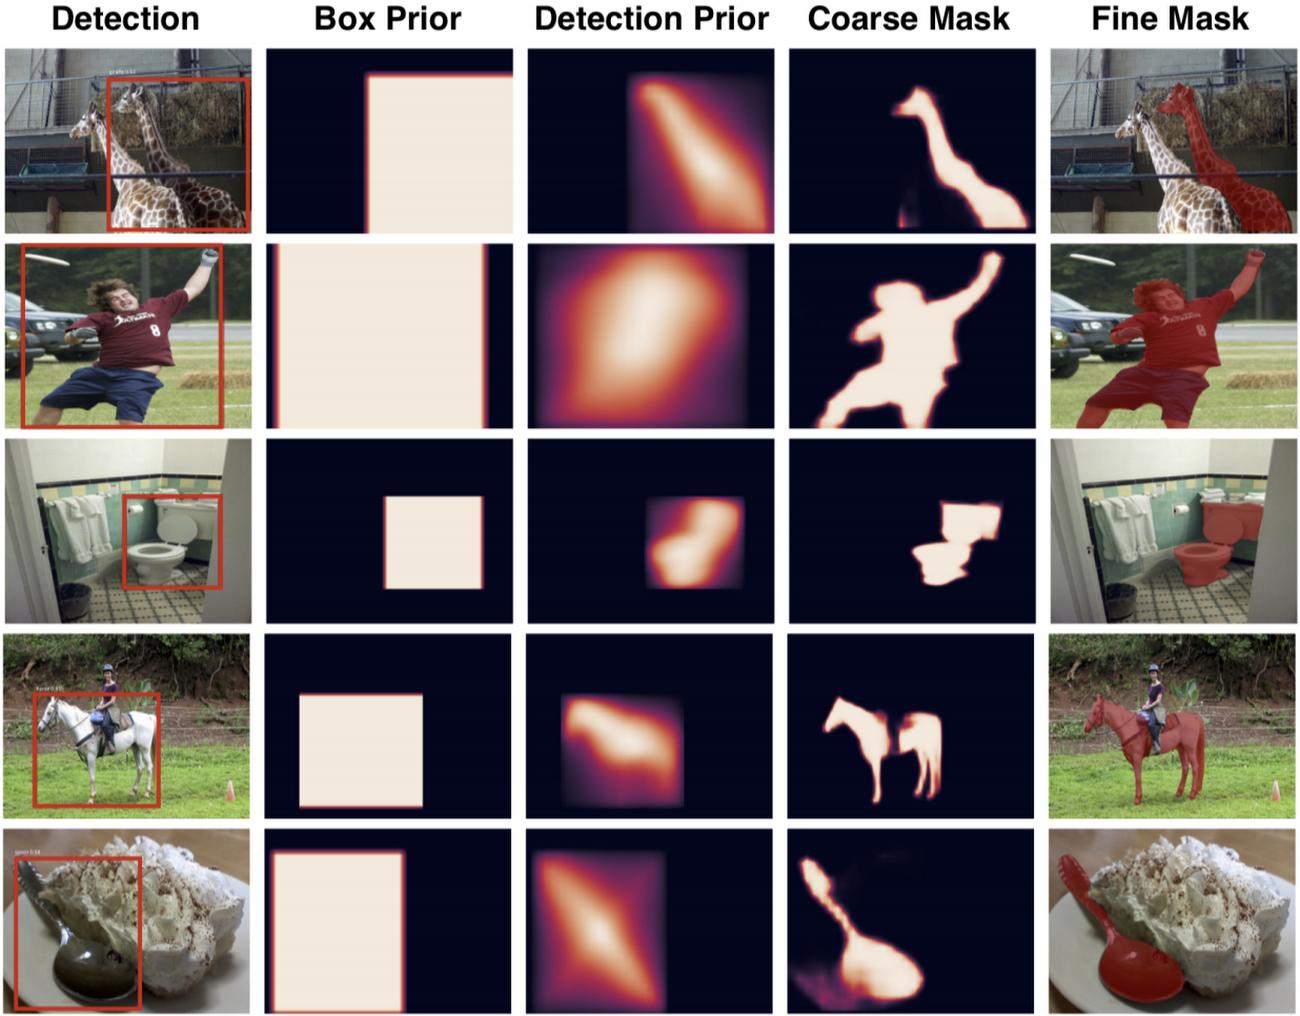 ShapeMask: A new ML model for instance segmentation